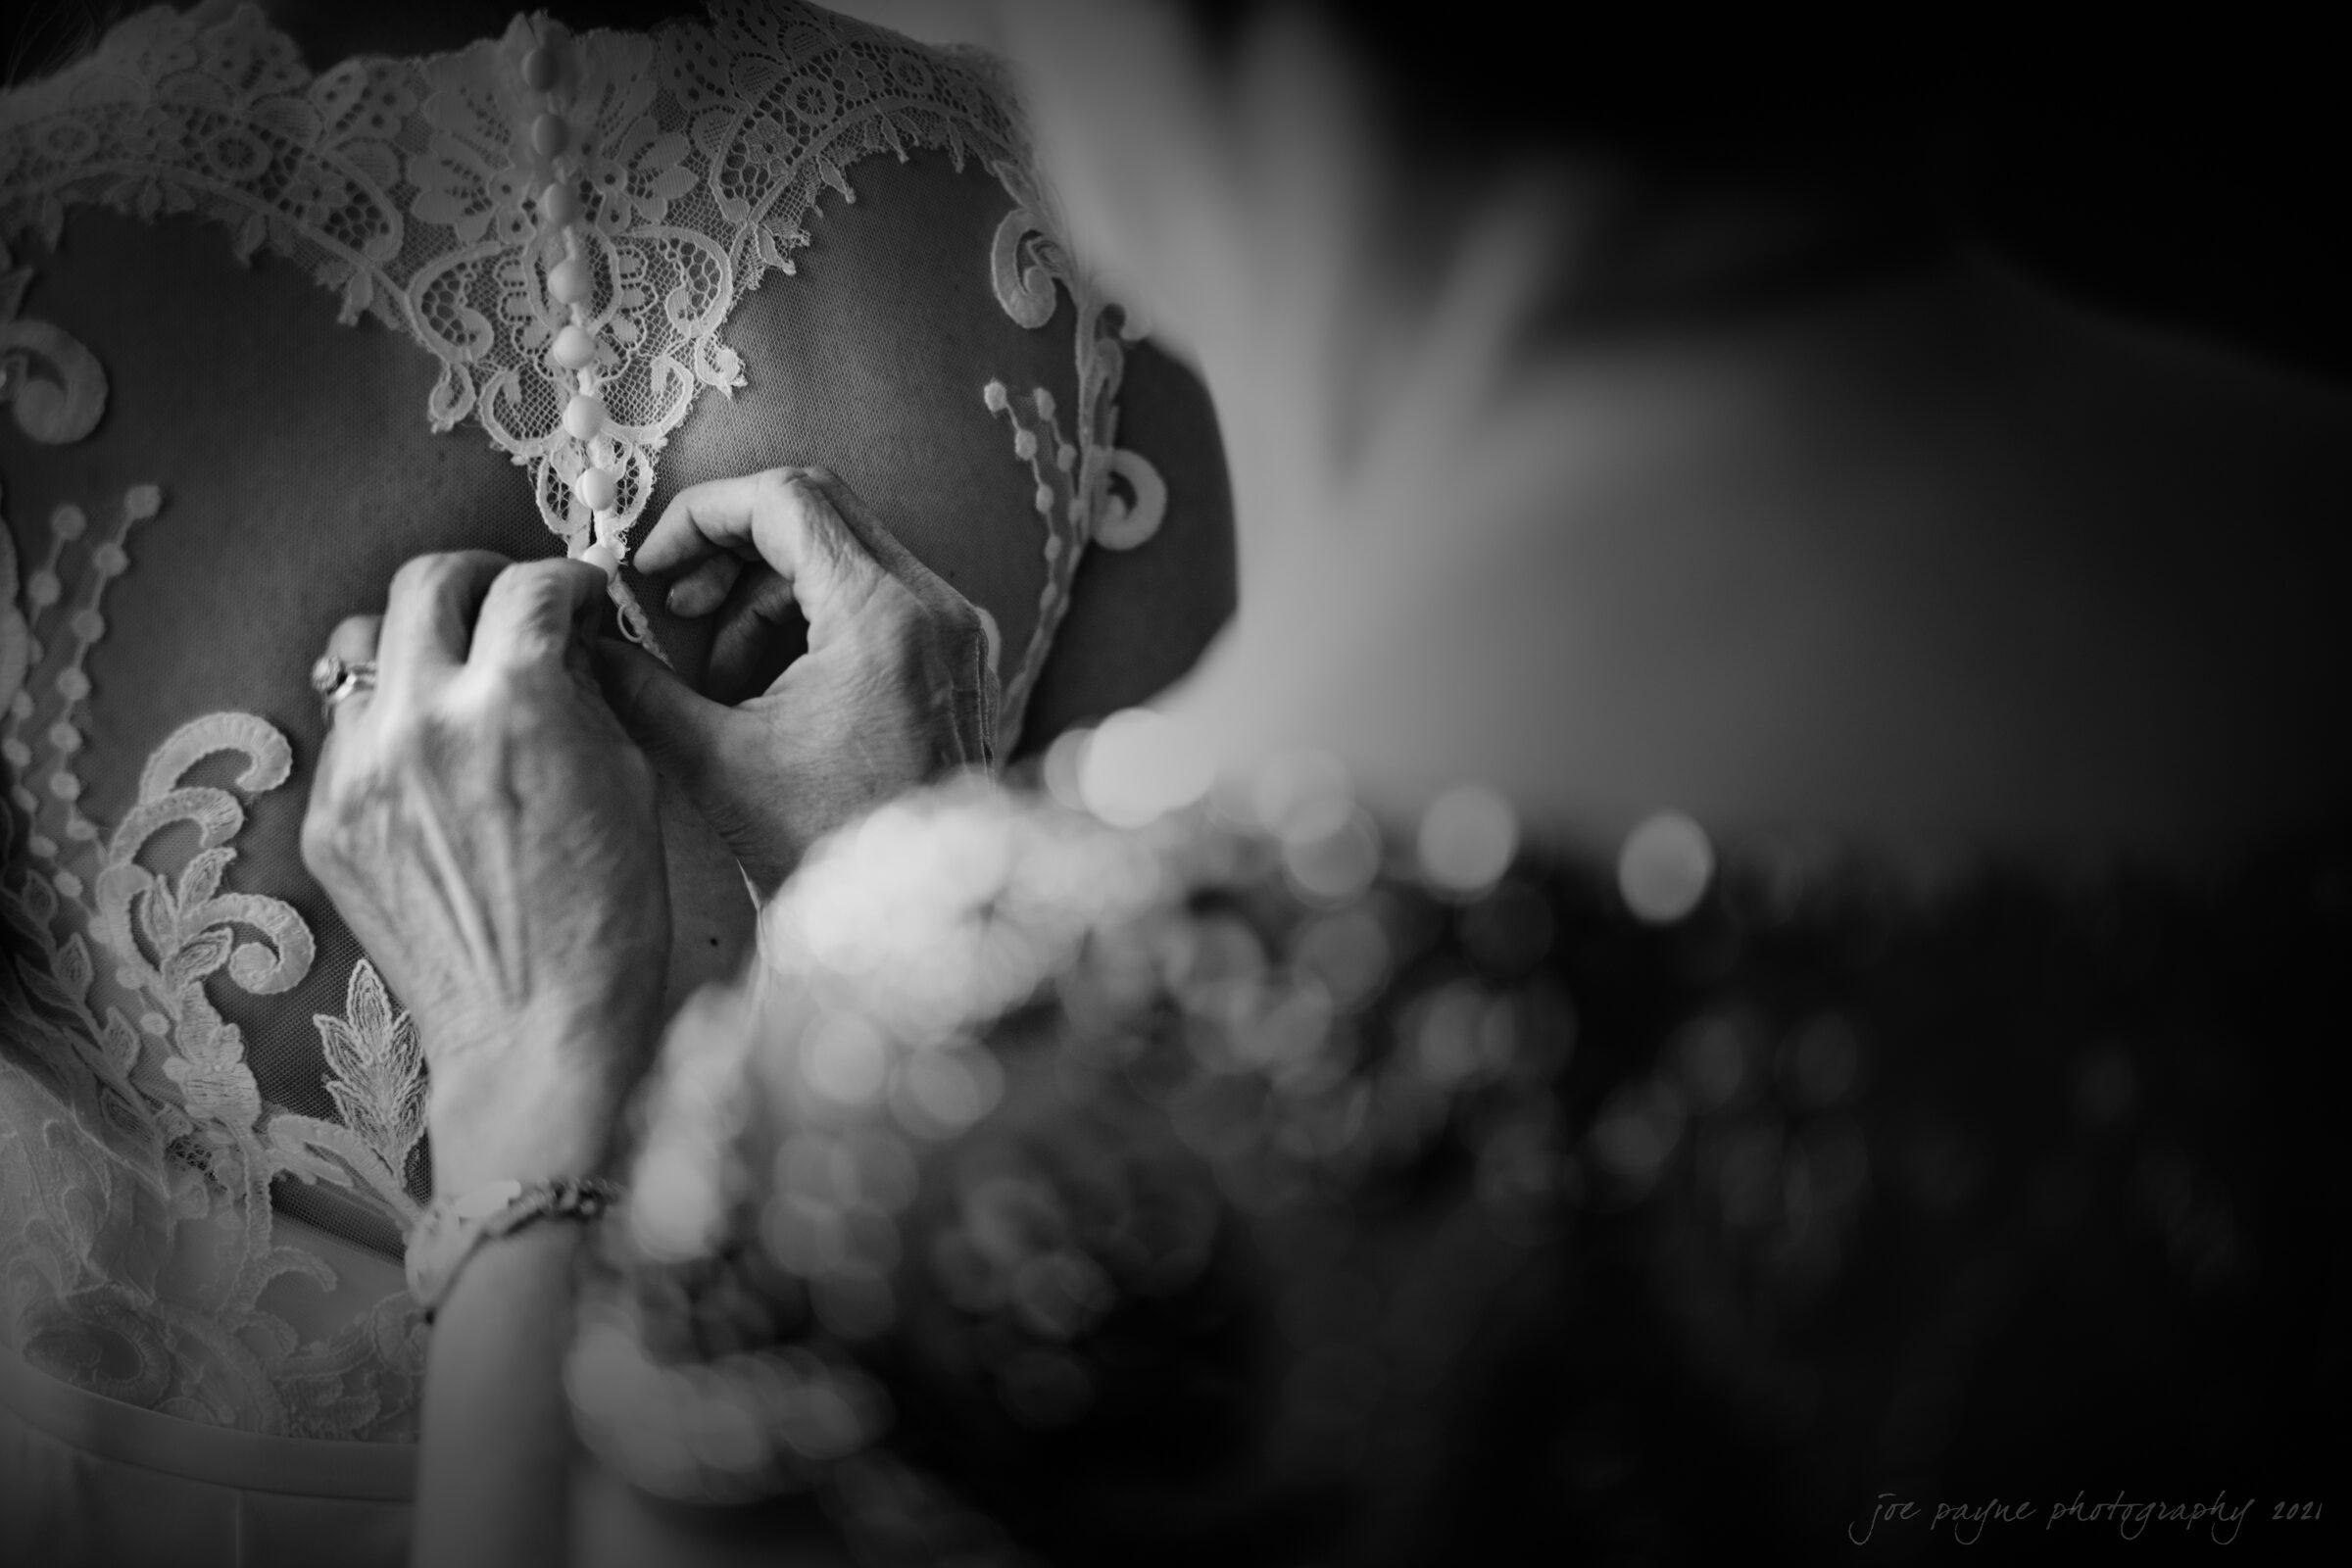 Cotton Room Wedding Photographer Kate Martin 1 3